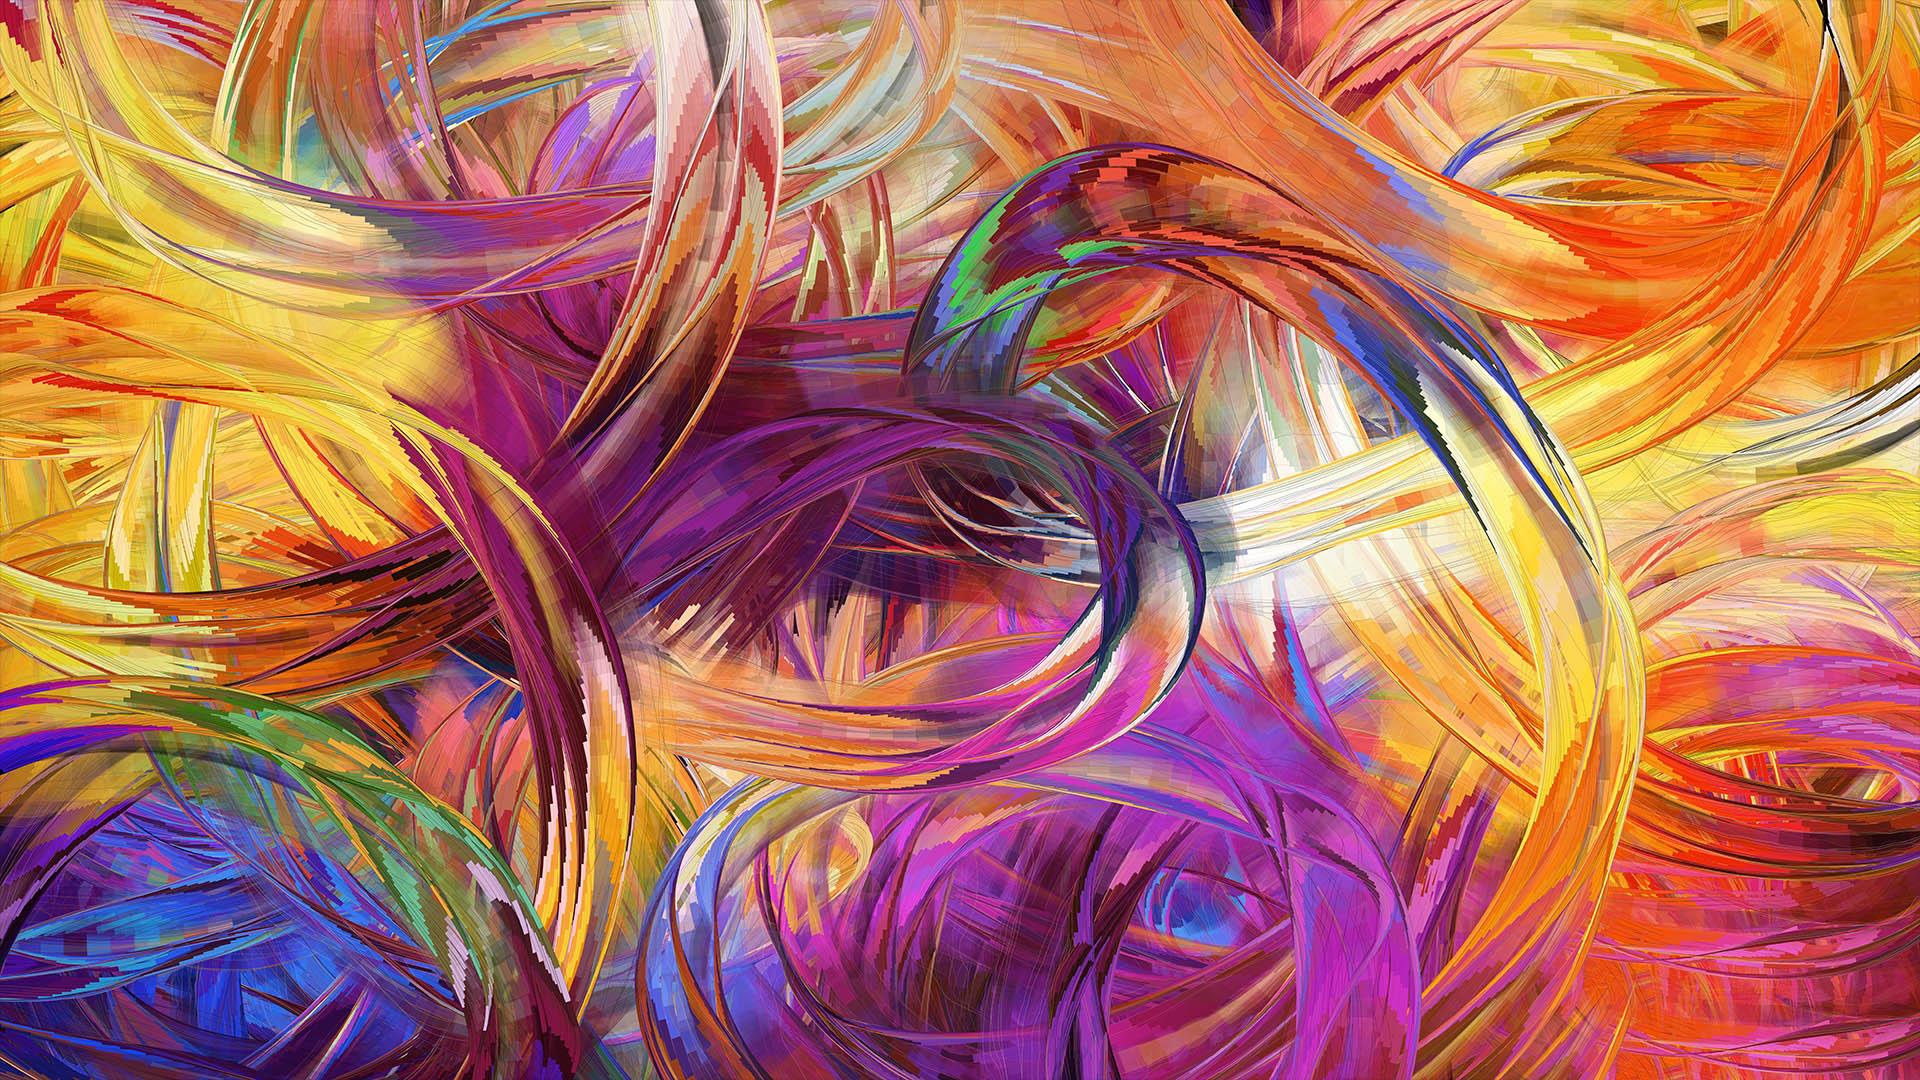 Finger Painting Art HD Wallpaper 3D Abstract Wallpapers 1920x1080